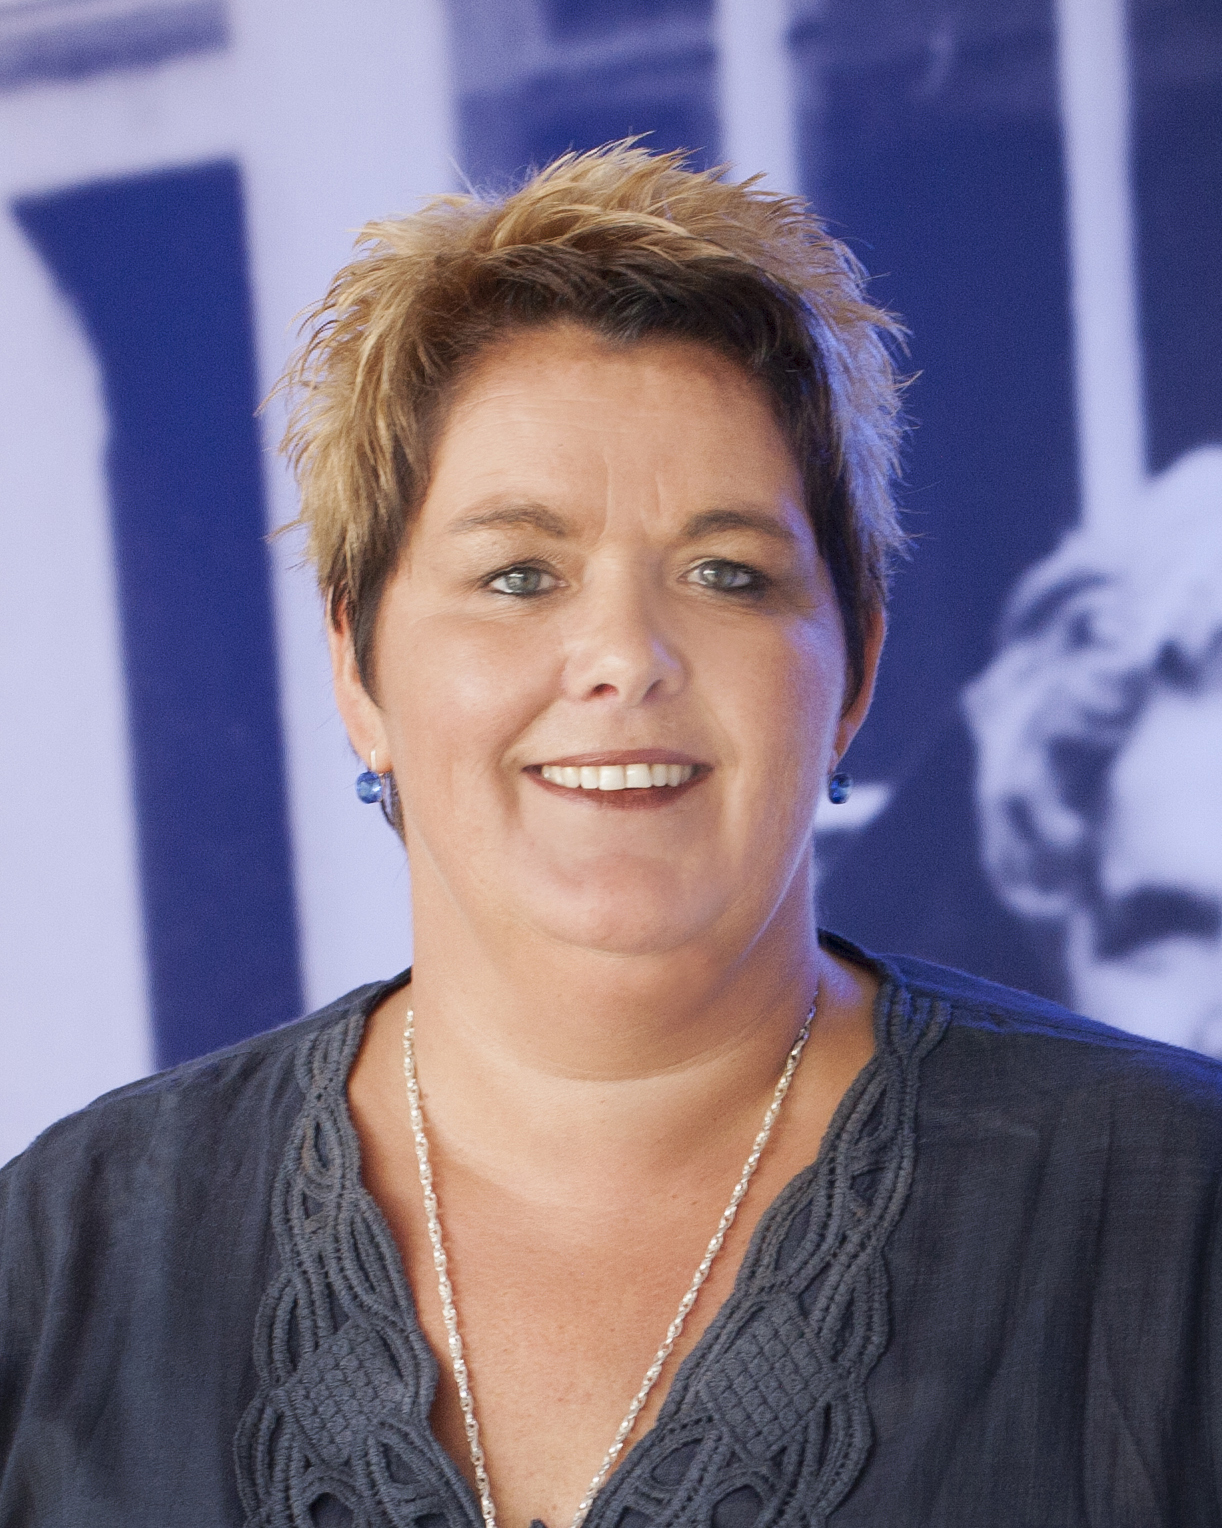 Casandra Theunissen